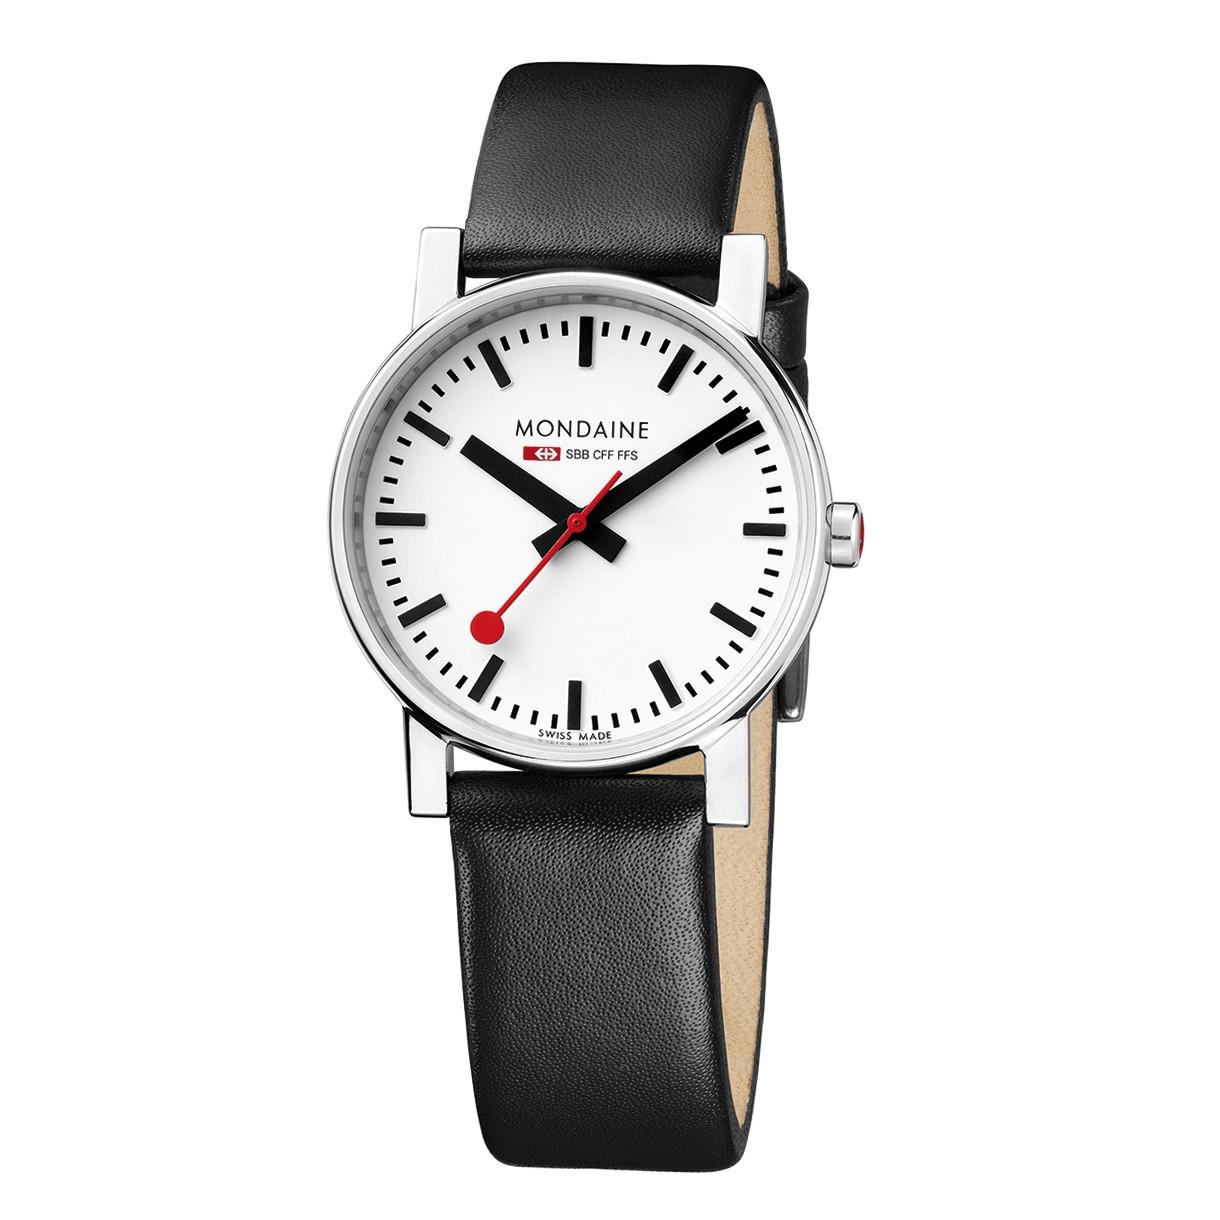 Mondaine swiss watch EVO GENTS - A658.30300.11SBB